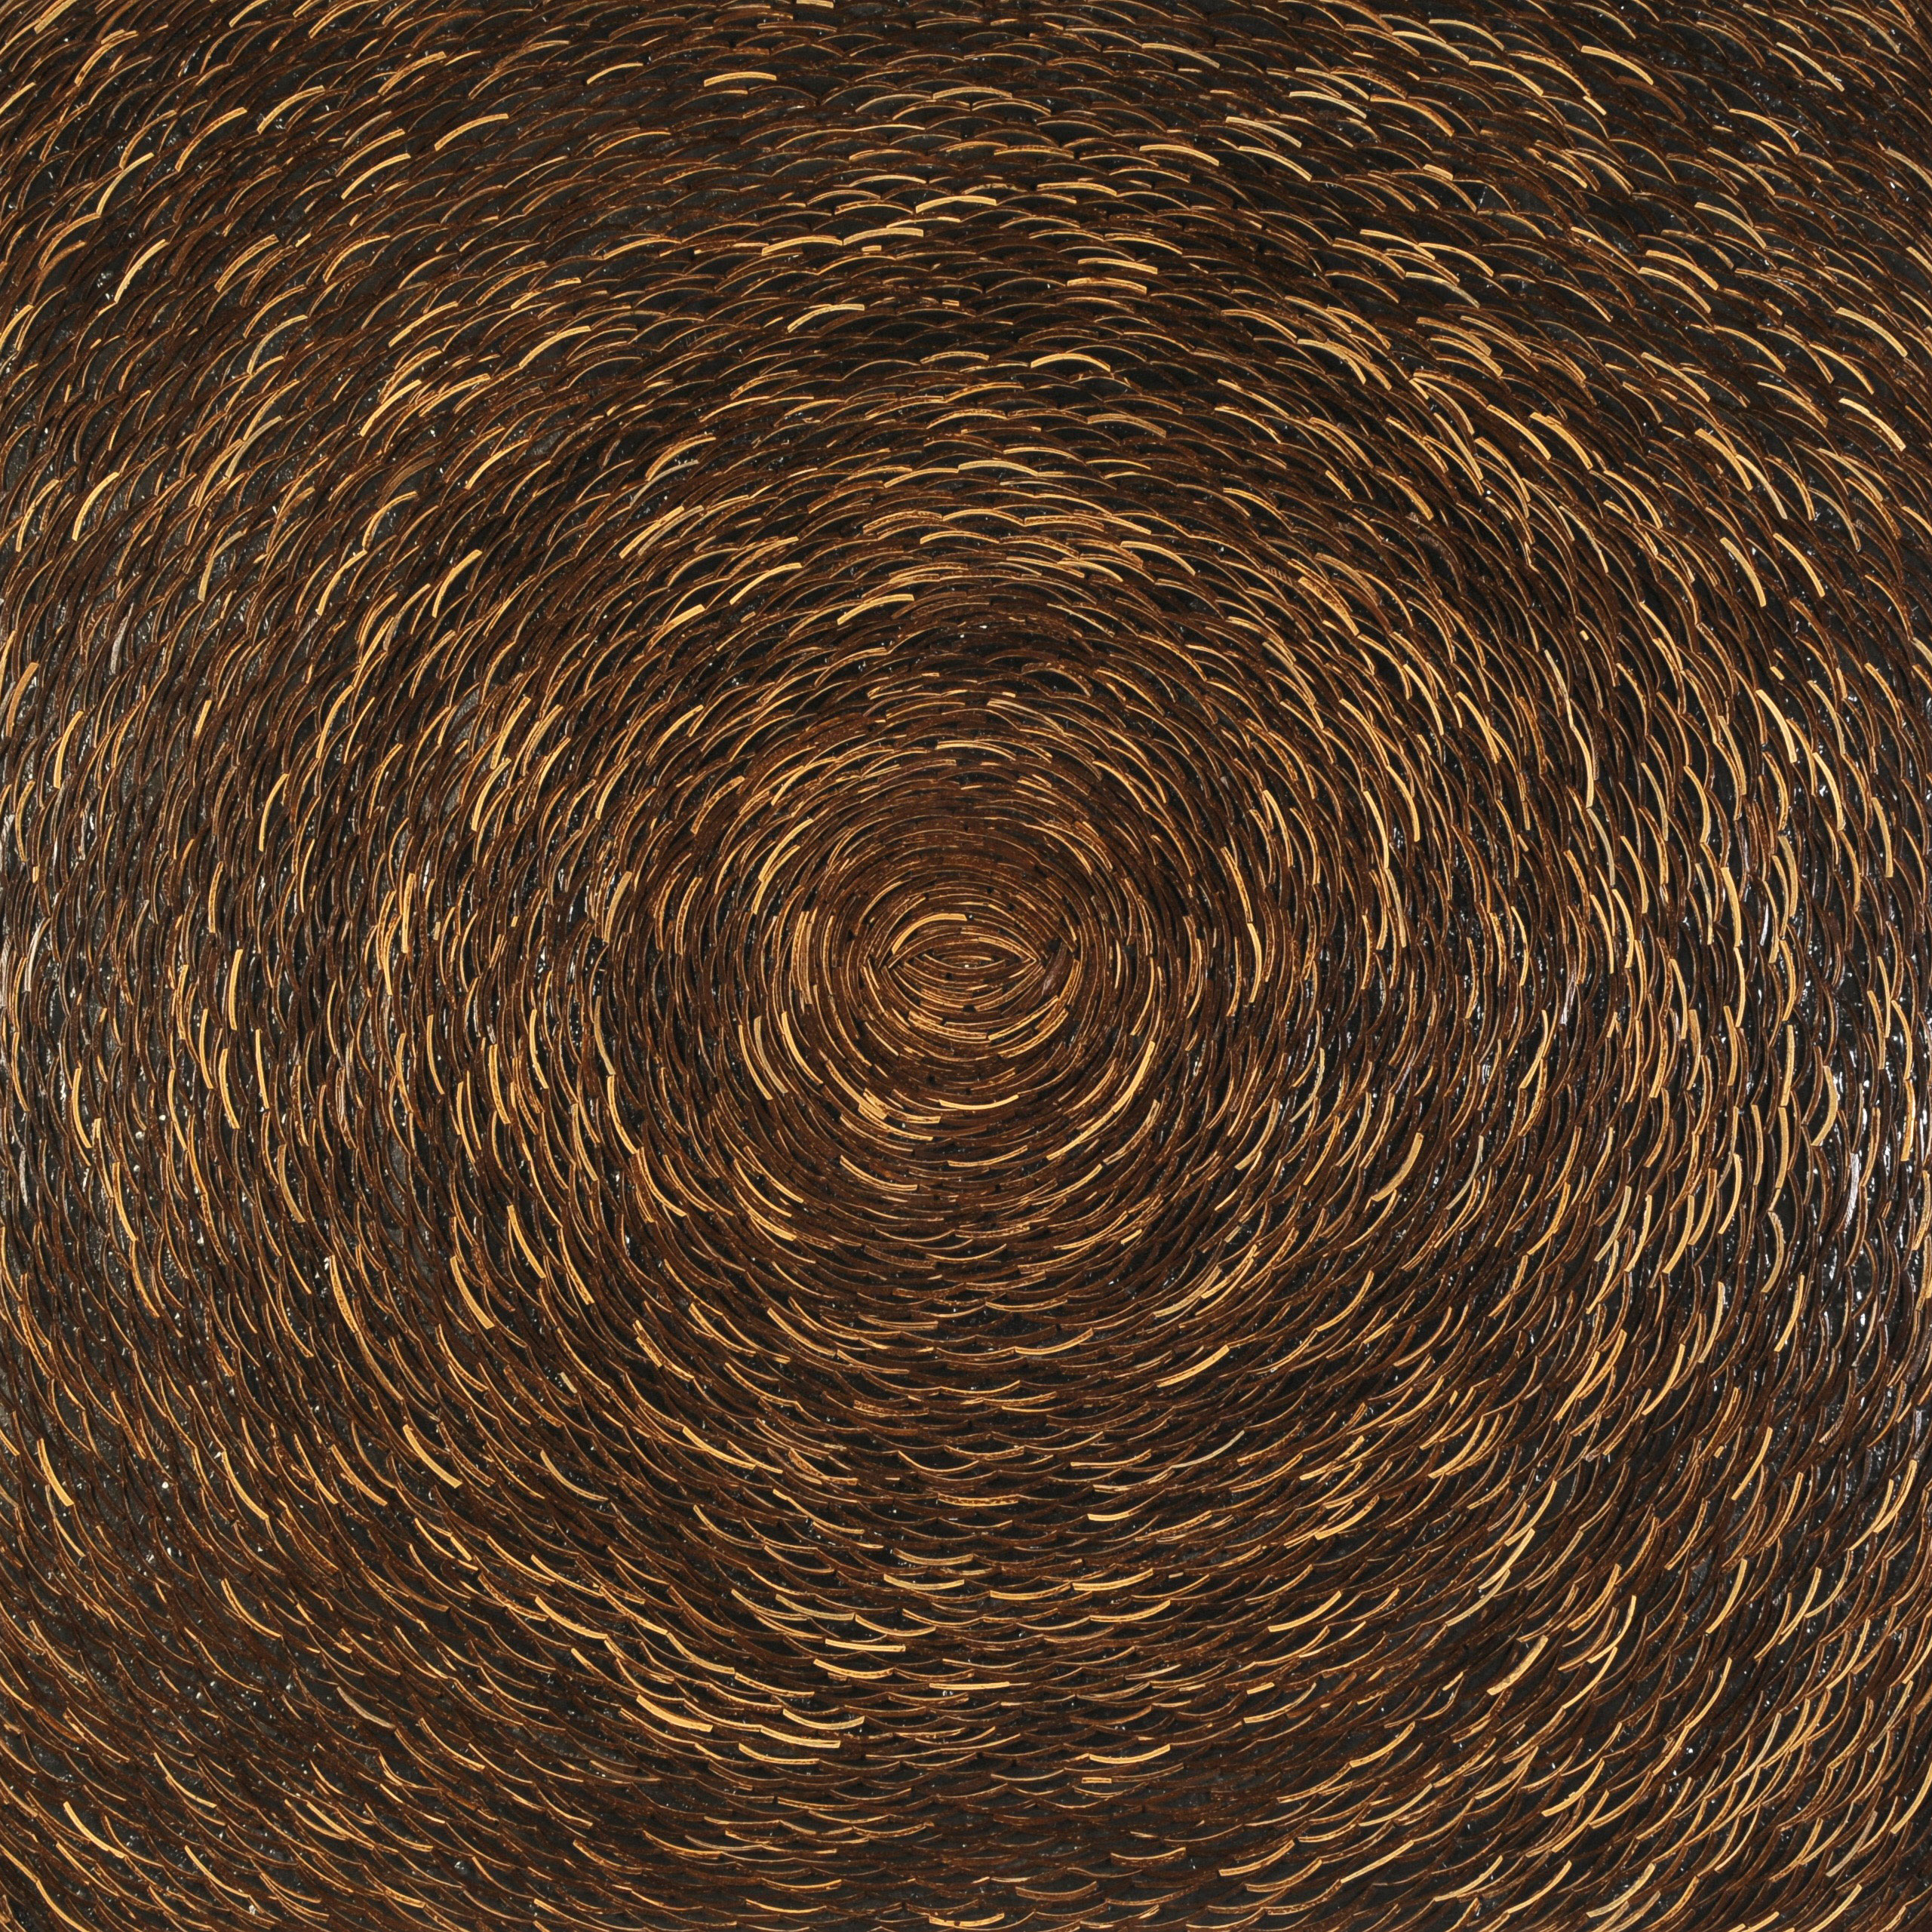 Garcia Palm Coconut Shell Laminated Marine Plywood